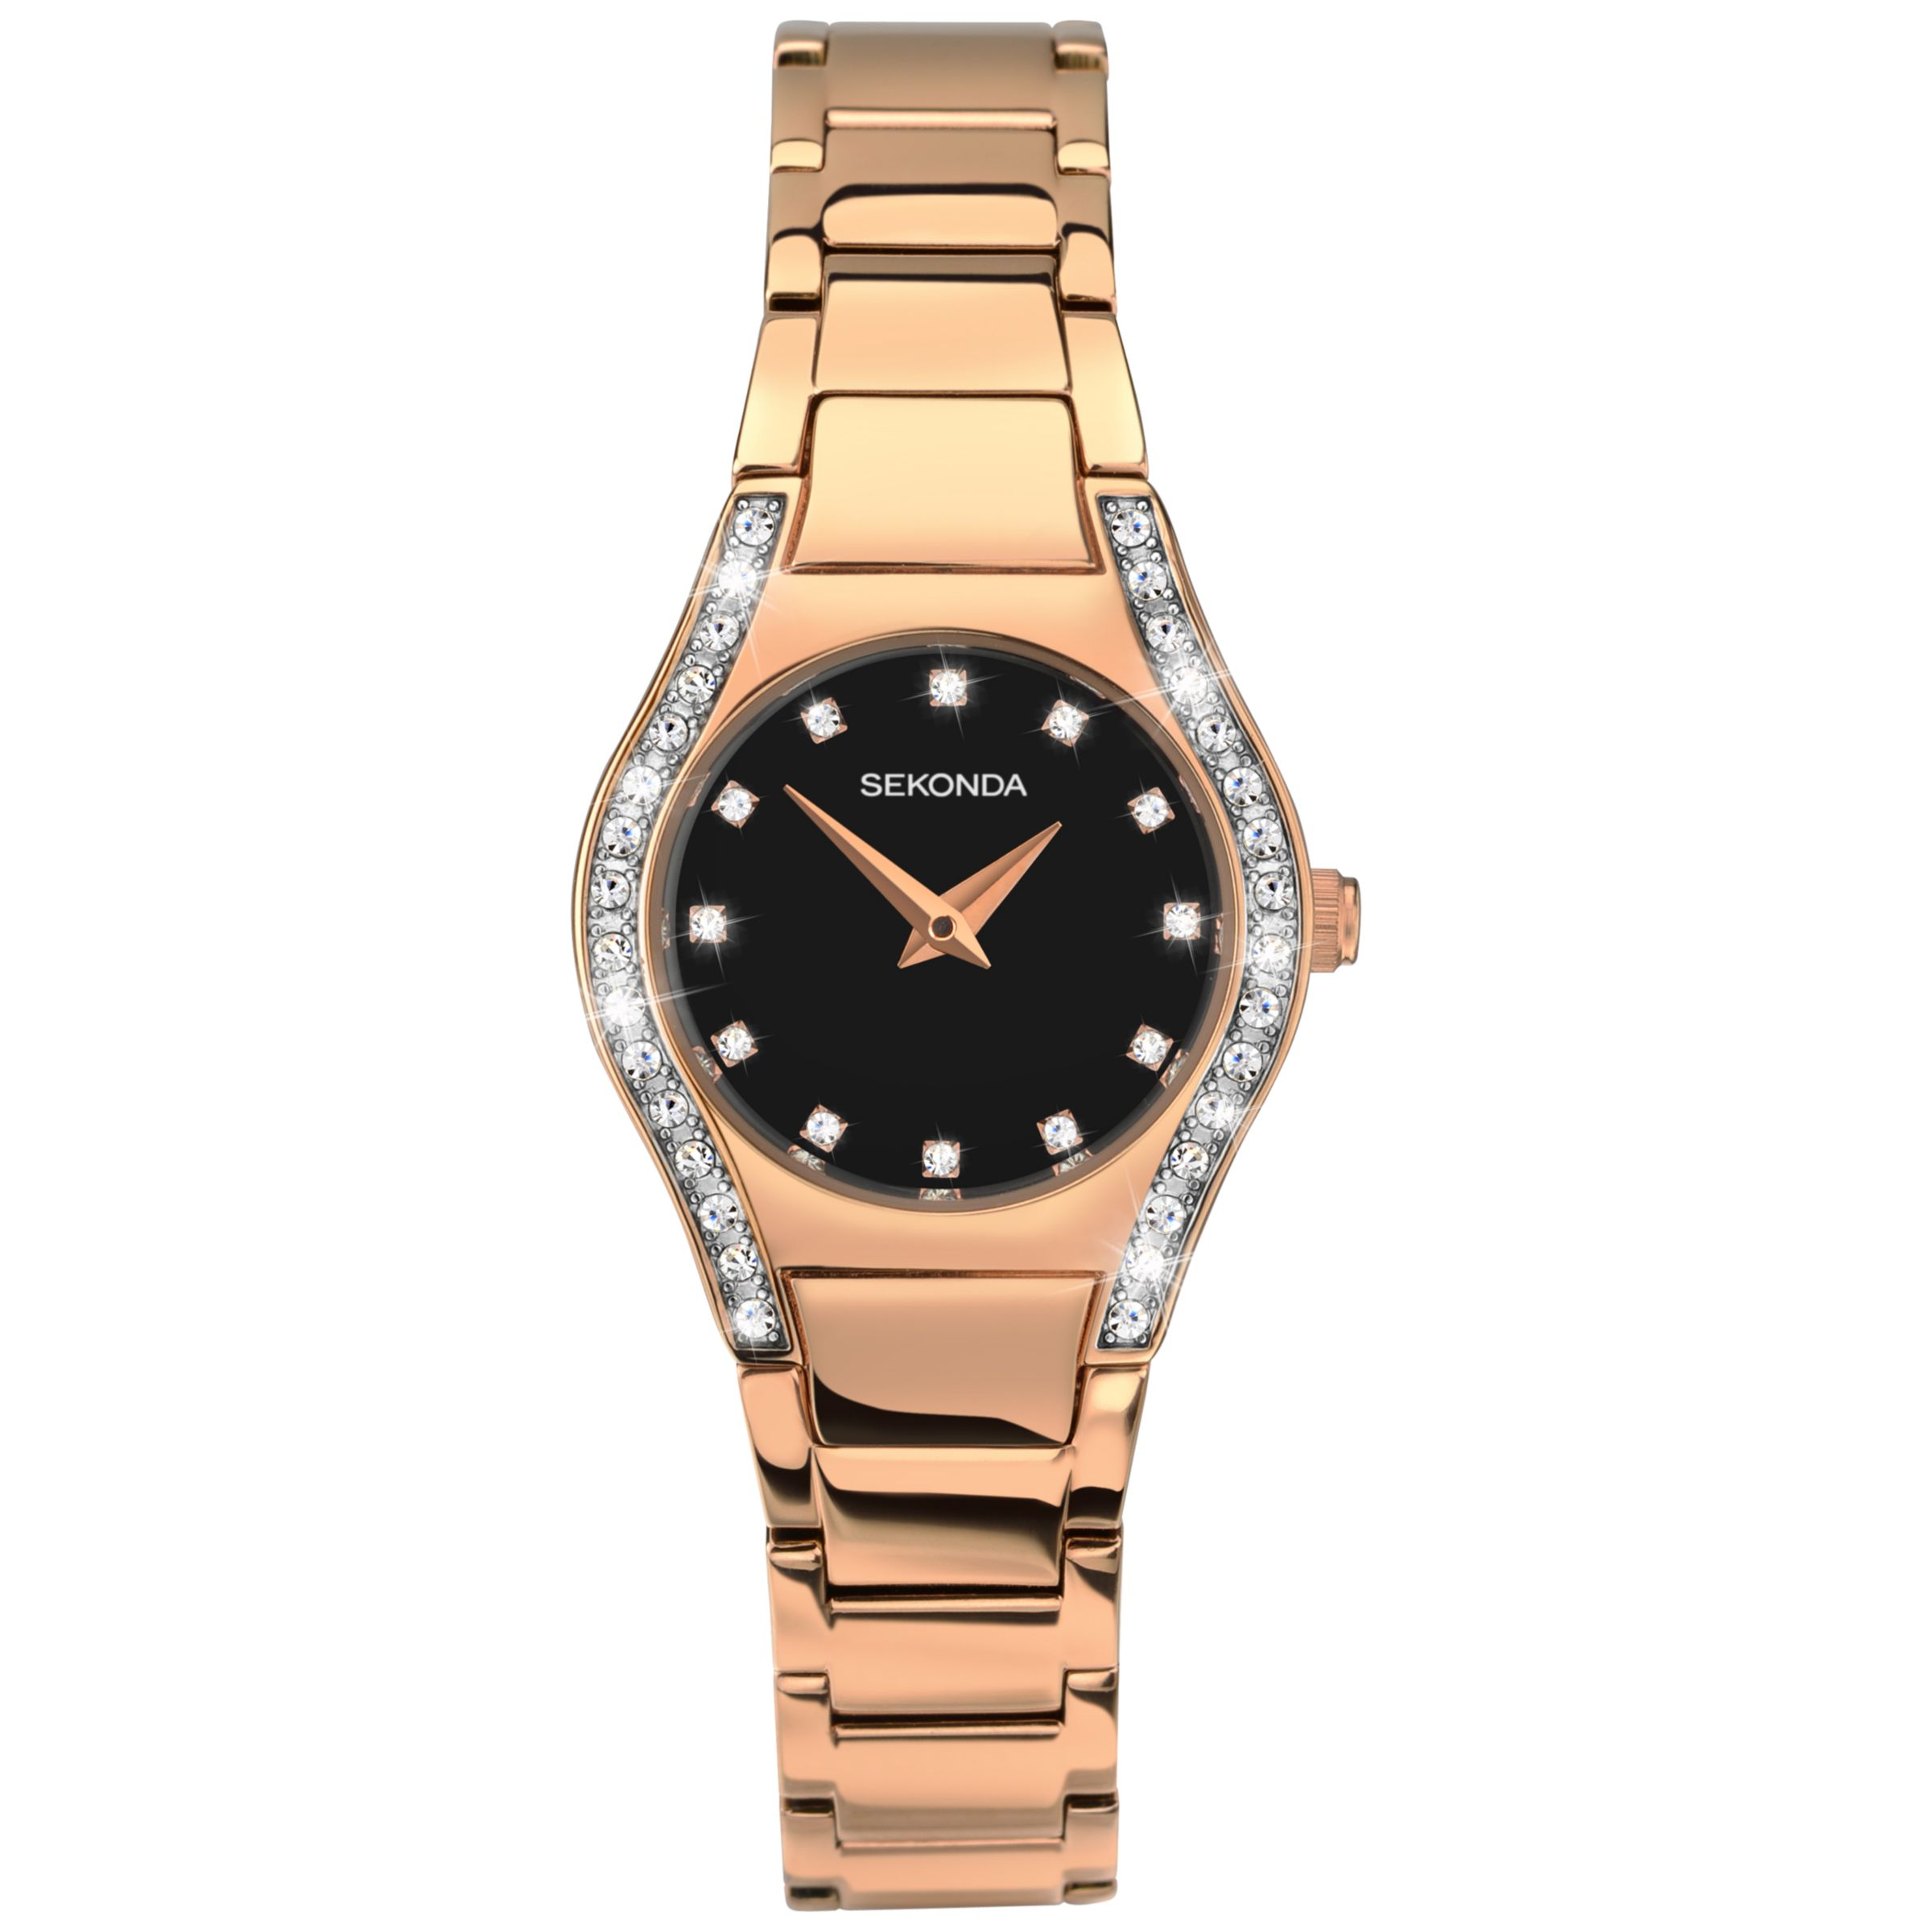 Sekonda Sekonda 2200.27 Women's Aurora Diamante Bracelet Strap Watch, Rose Gold/Black